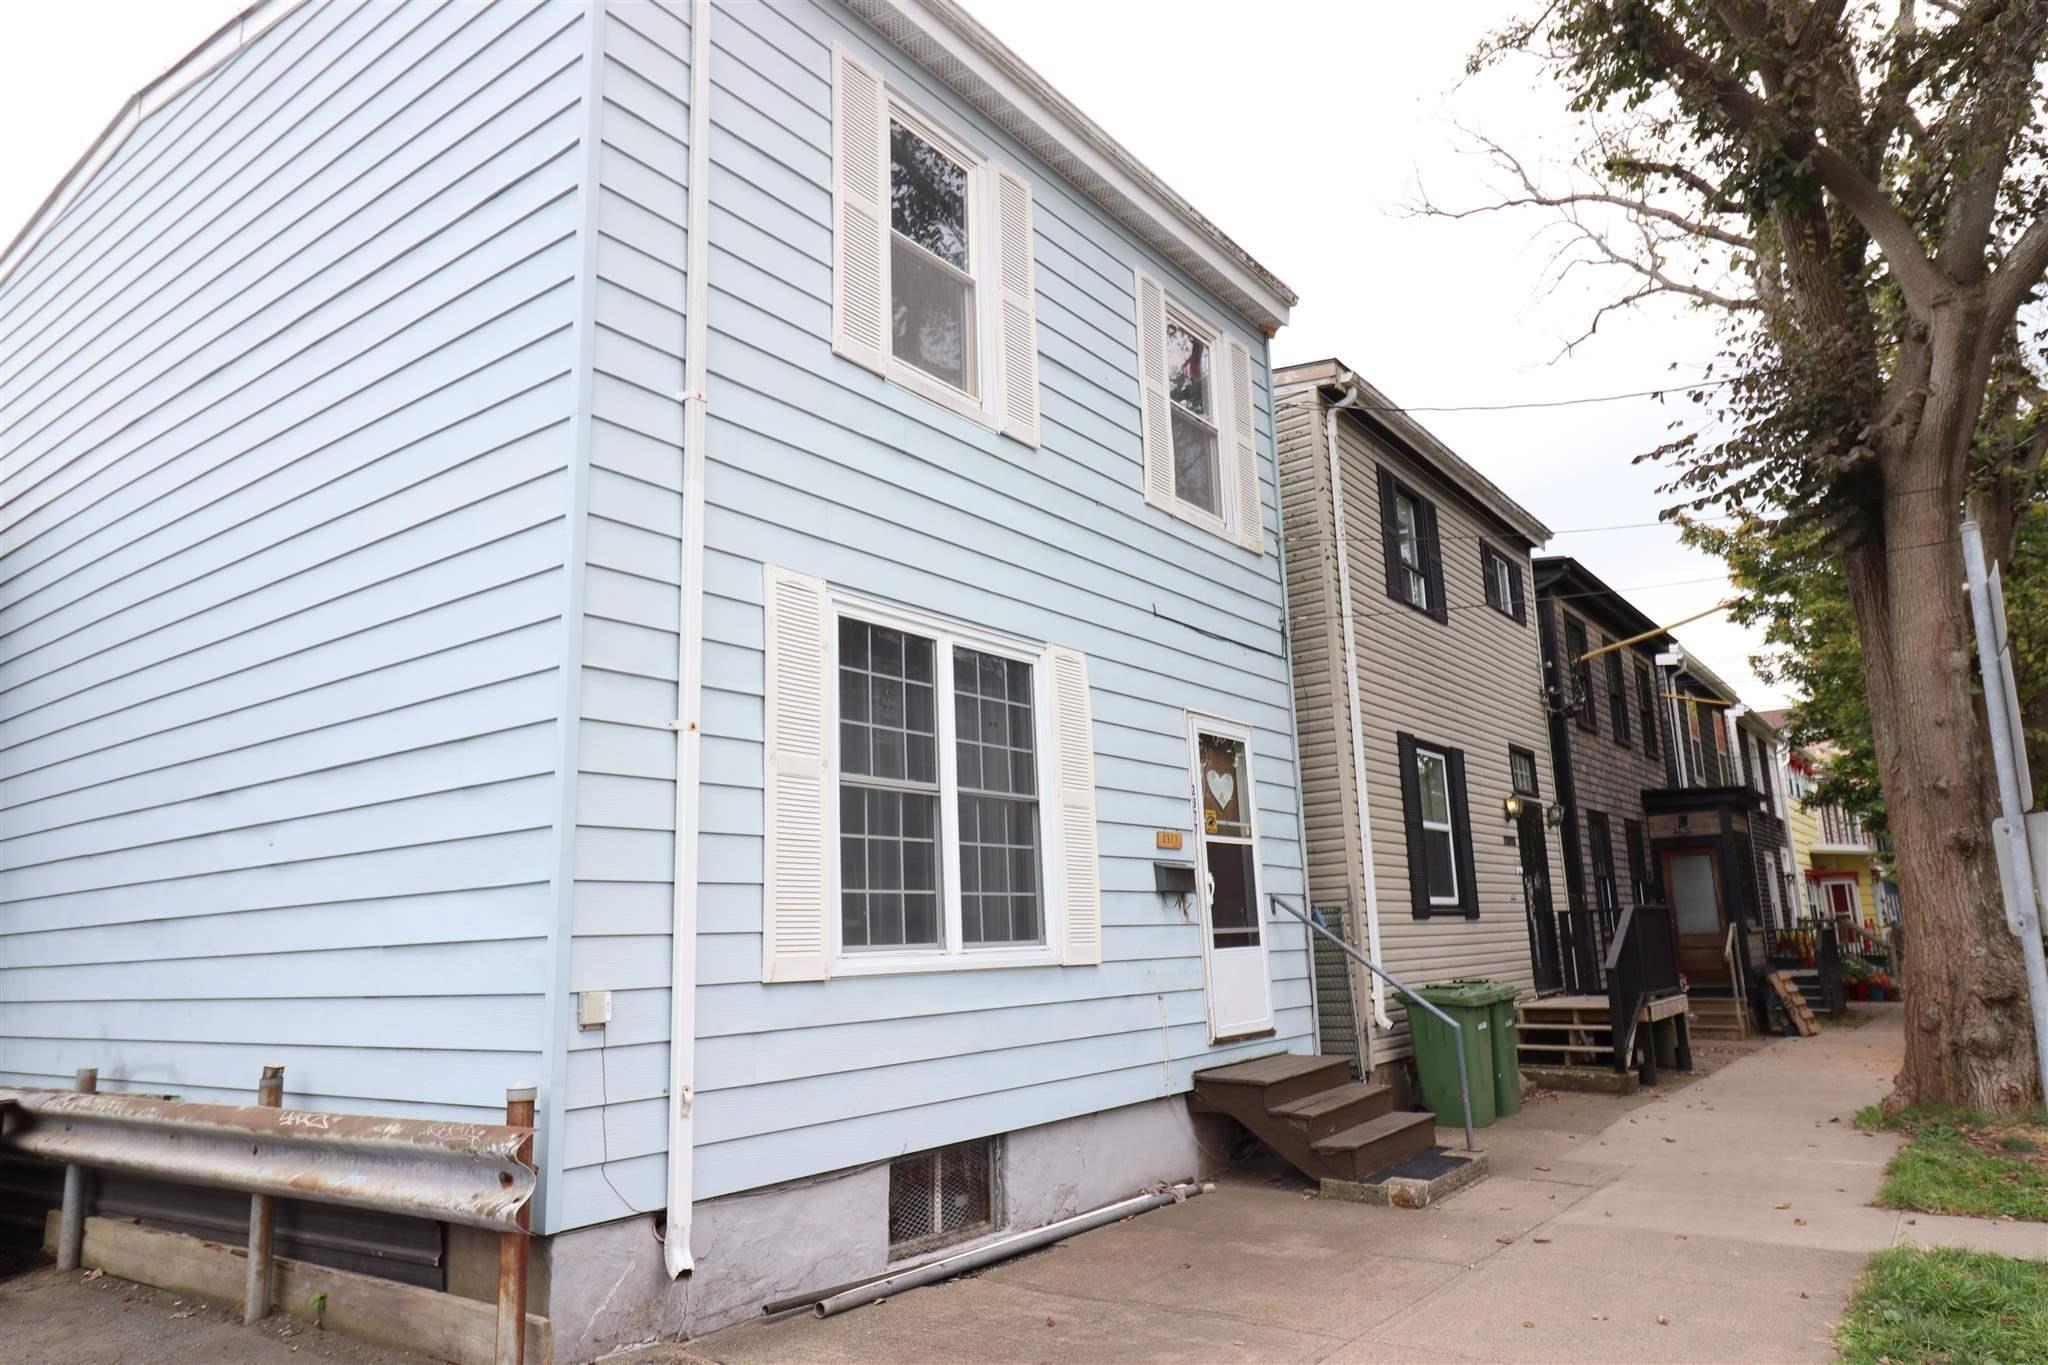 Main Photo: 2377 Maynard Street in Halifax: 1-Halifax Central Residential for sale (Halifax-Dartmouth)  : MLS®# 202125864